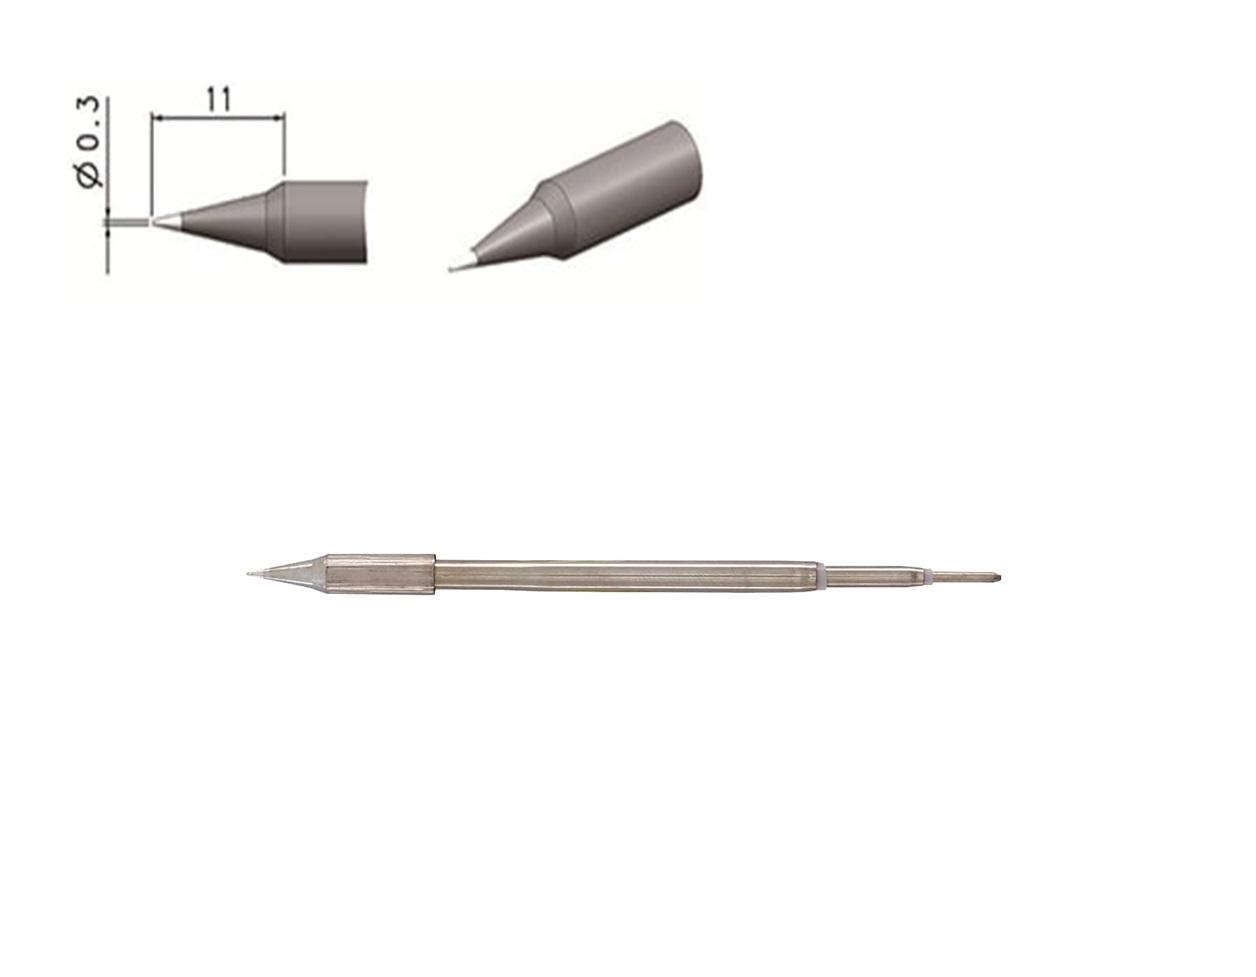 Toor T12-i0.3 Ponta Ferro de Solda Reta para Toor/ Tool T12-11